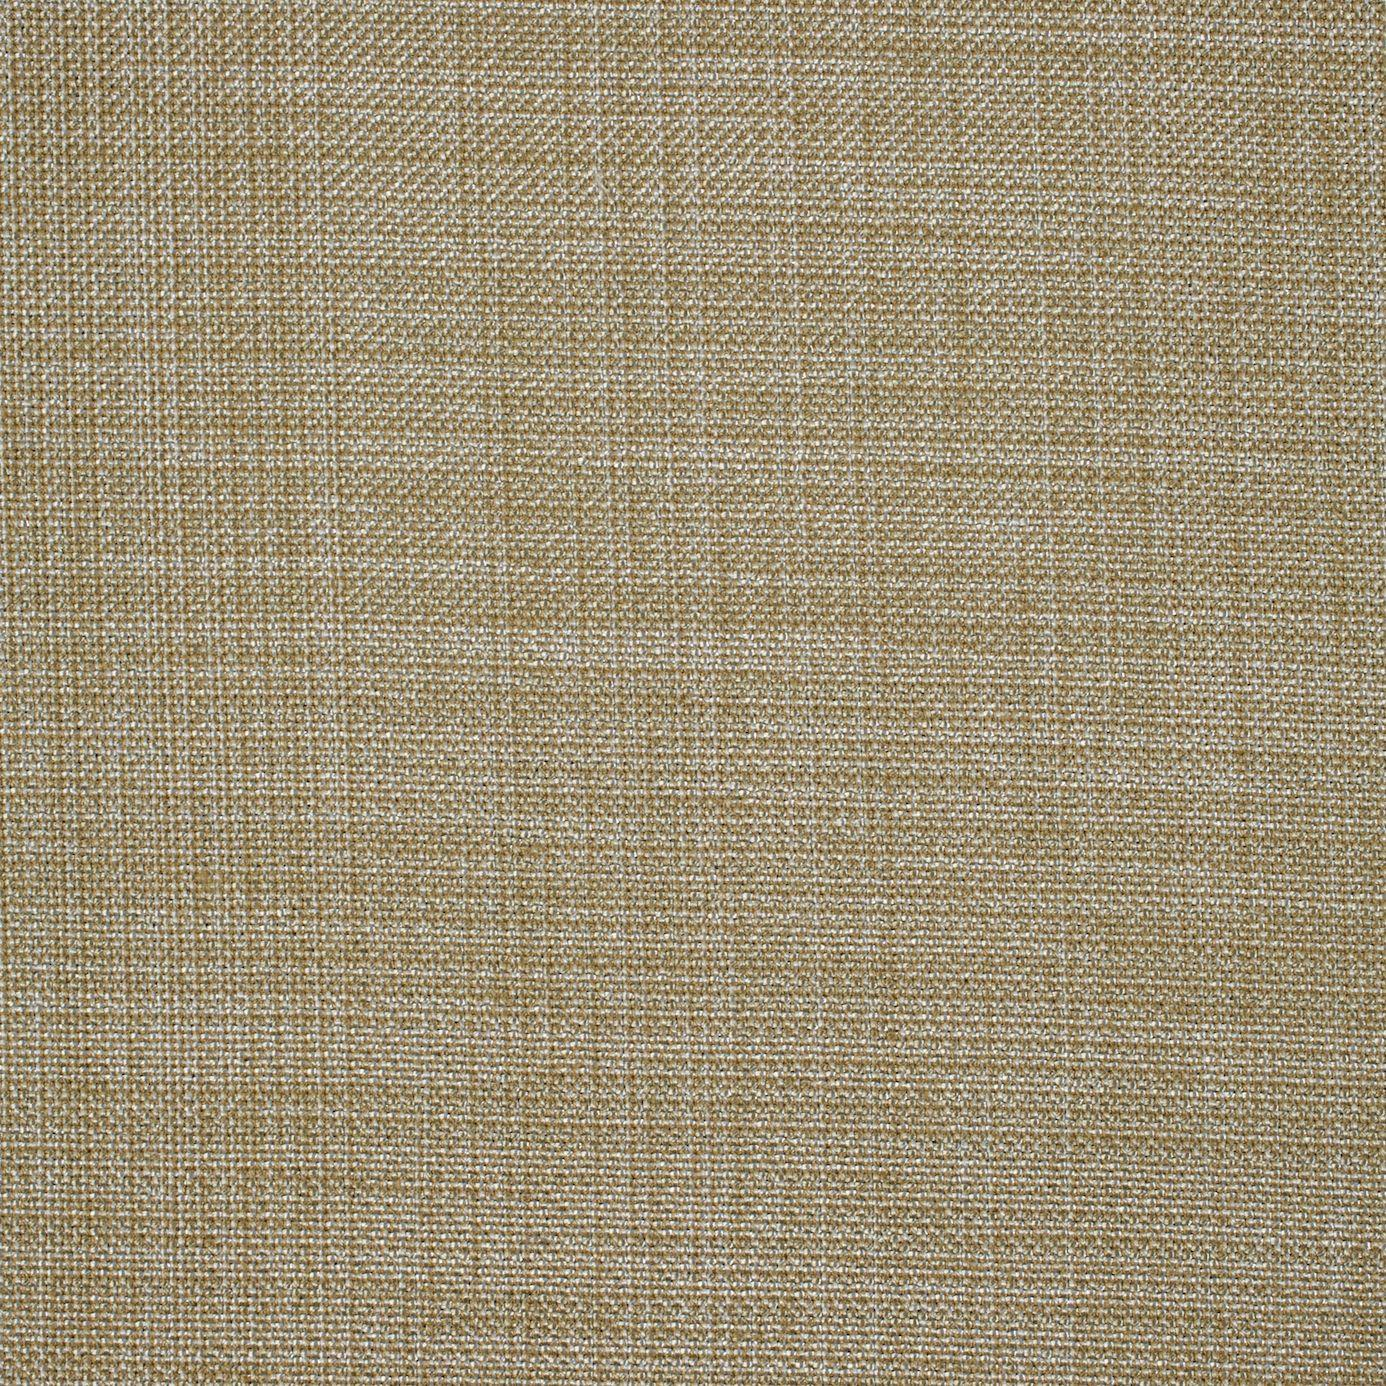 Curtains In Celeste Fabric Hessian 2865 Harlequin Celeste Fabrics Collection